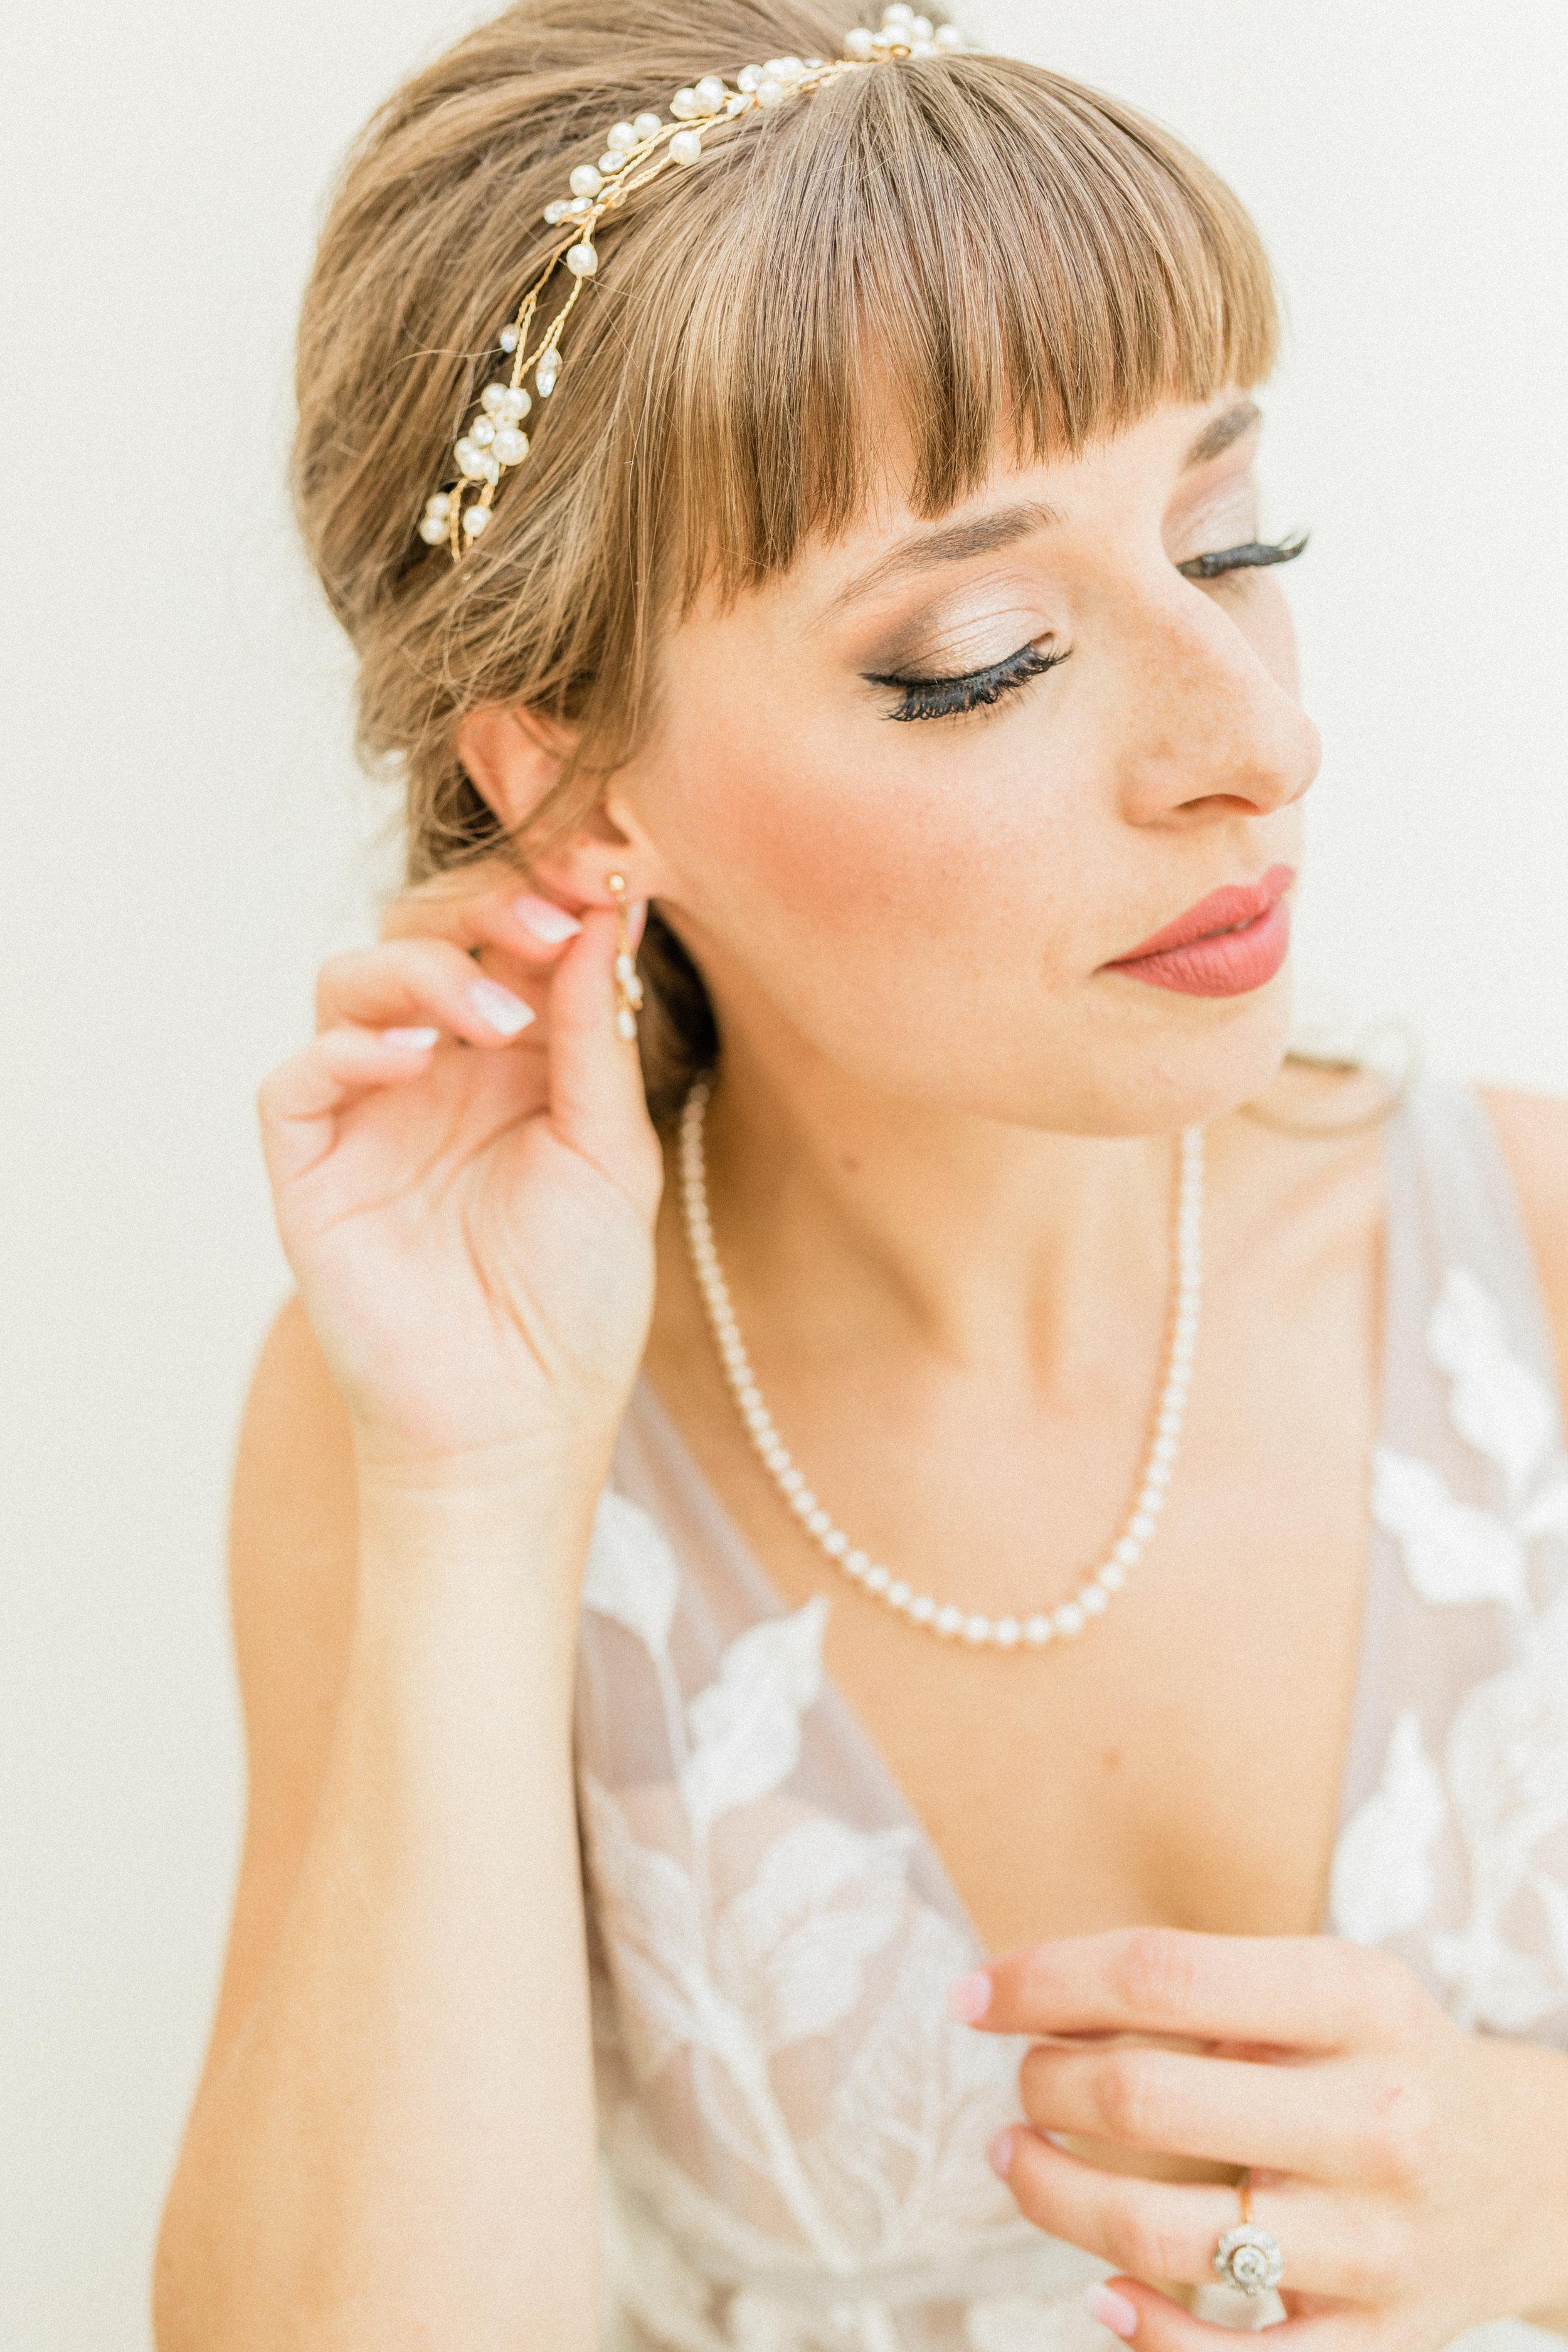 Mallory and Aaron - Married - Sneaks - Lauren Alisse Photography-13.jpg